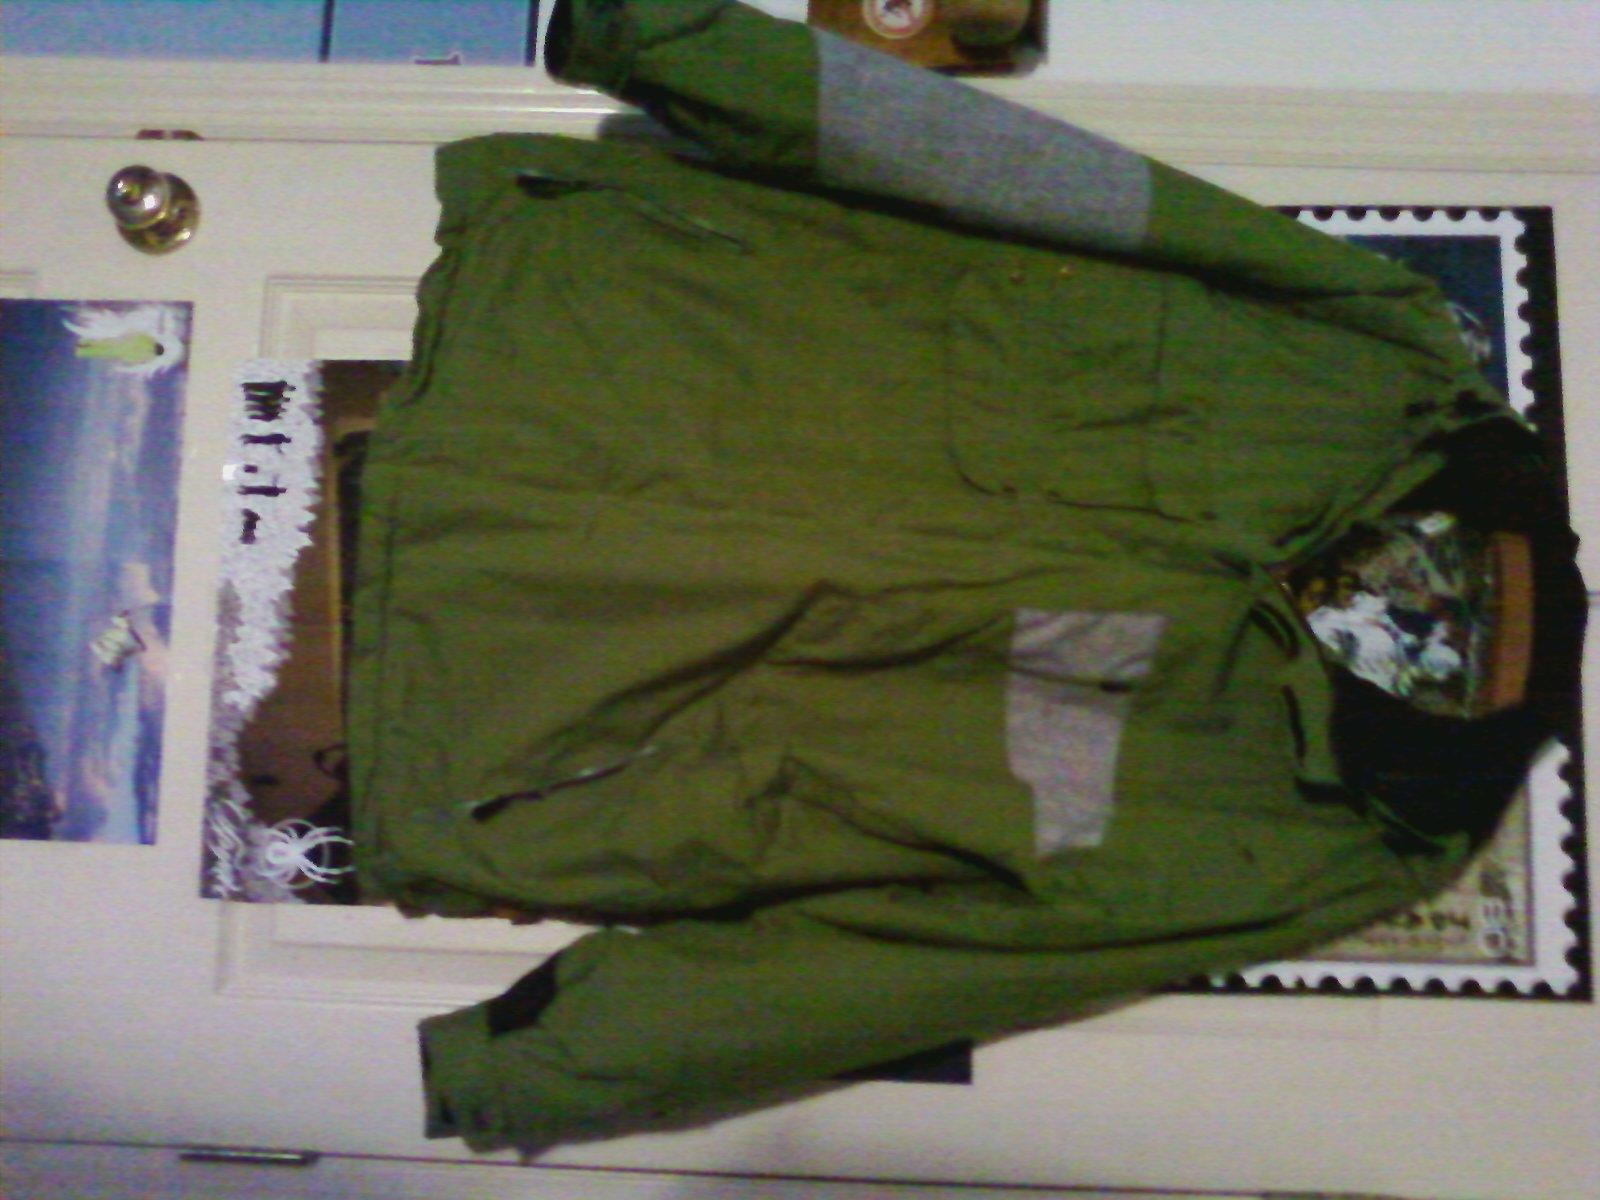 Obermyer jacket for sale